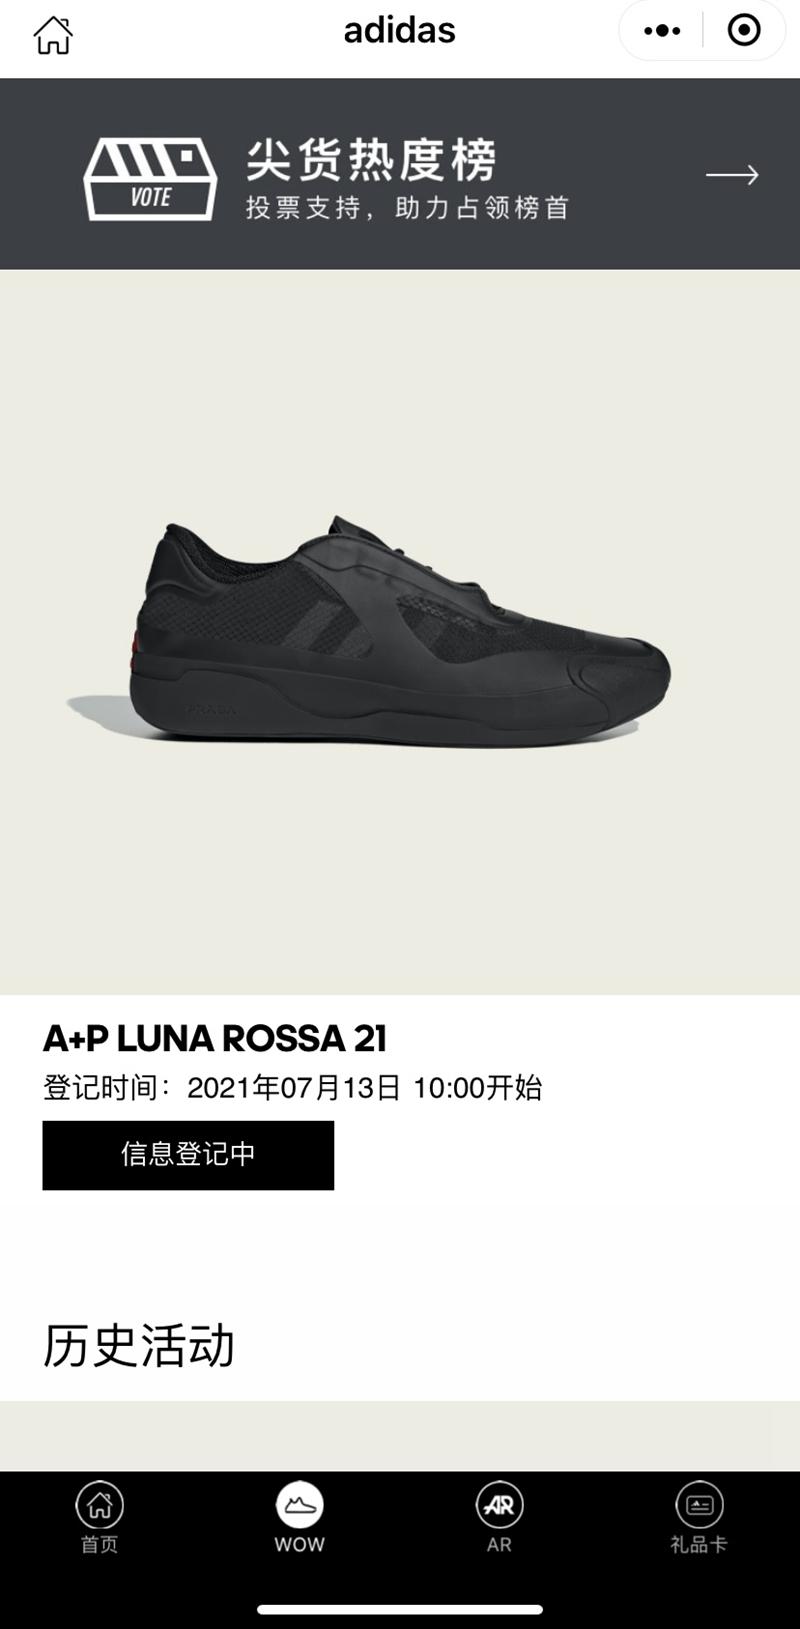 A+P LUNA ROSSA 21,PARDA,adidas  最后一天登记!原价入手 PRADA x adidas 的机会别错过!